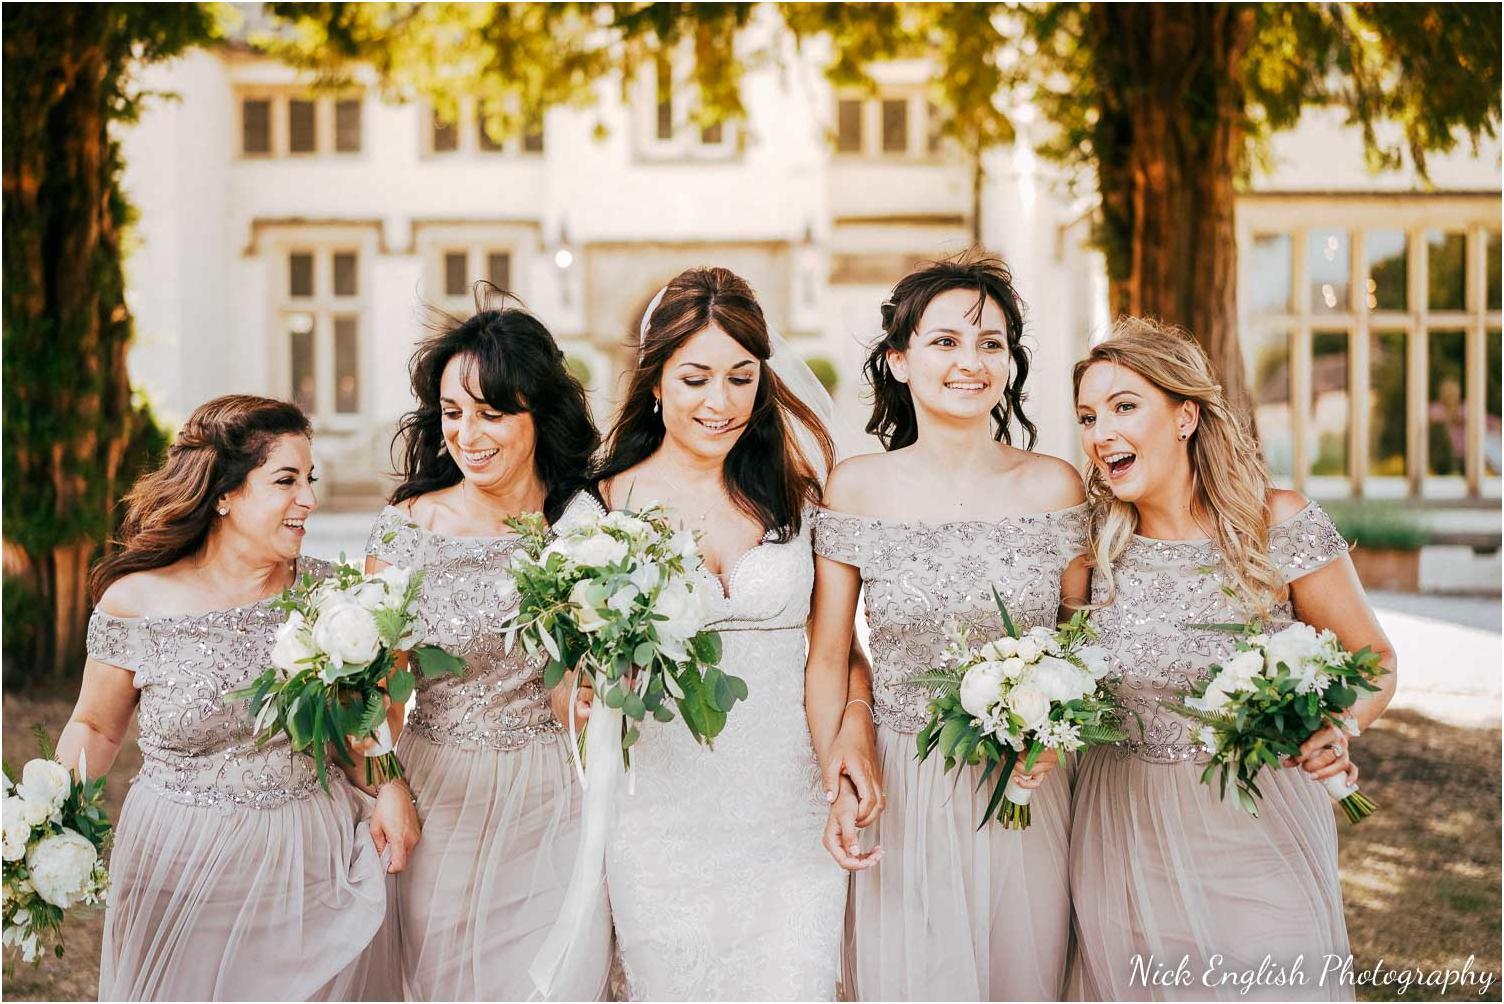 Mitton_Hall_Wedding_Photographer-66.jpg